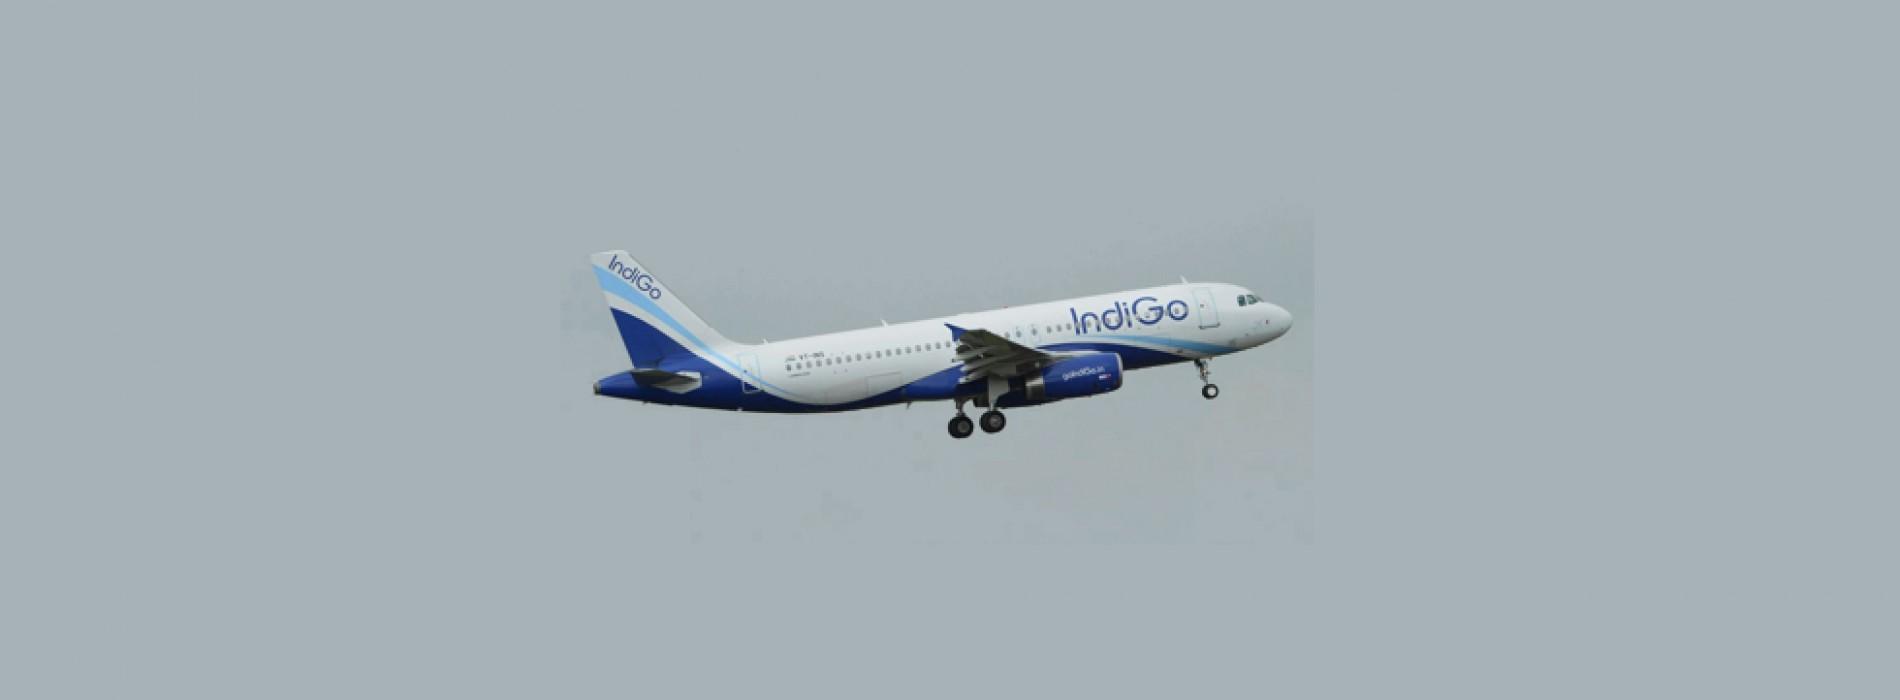 Bureau of Civil Aviation Security suspends IndiGo's security training centre licence